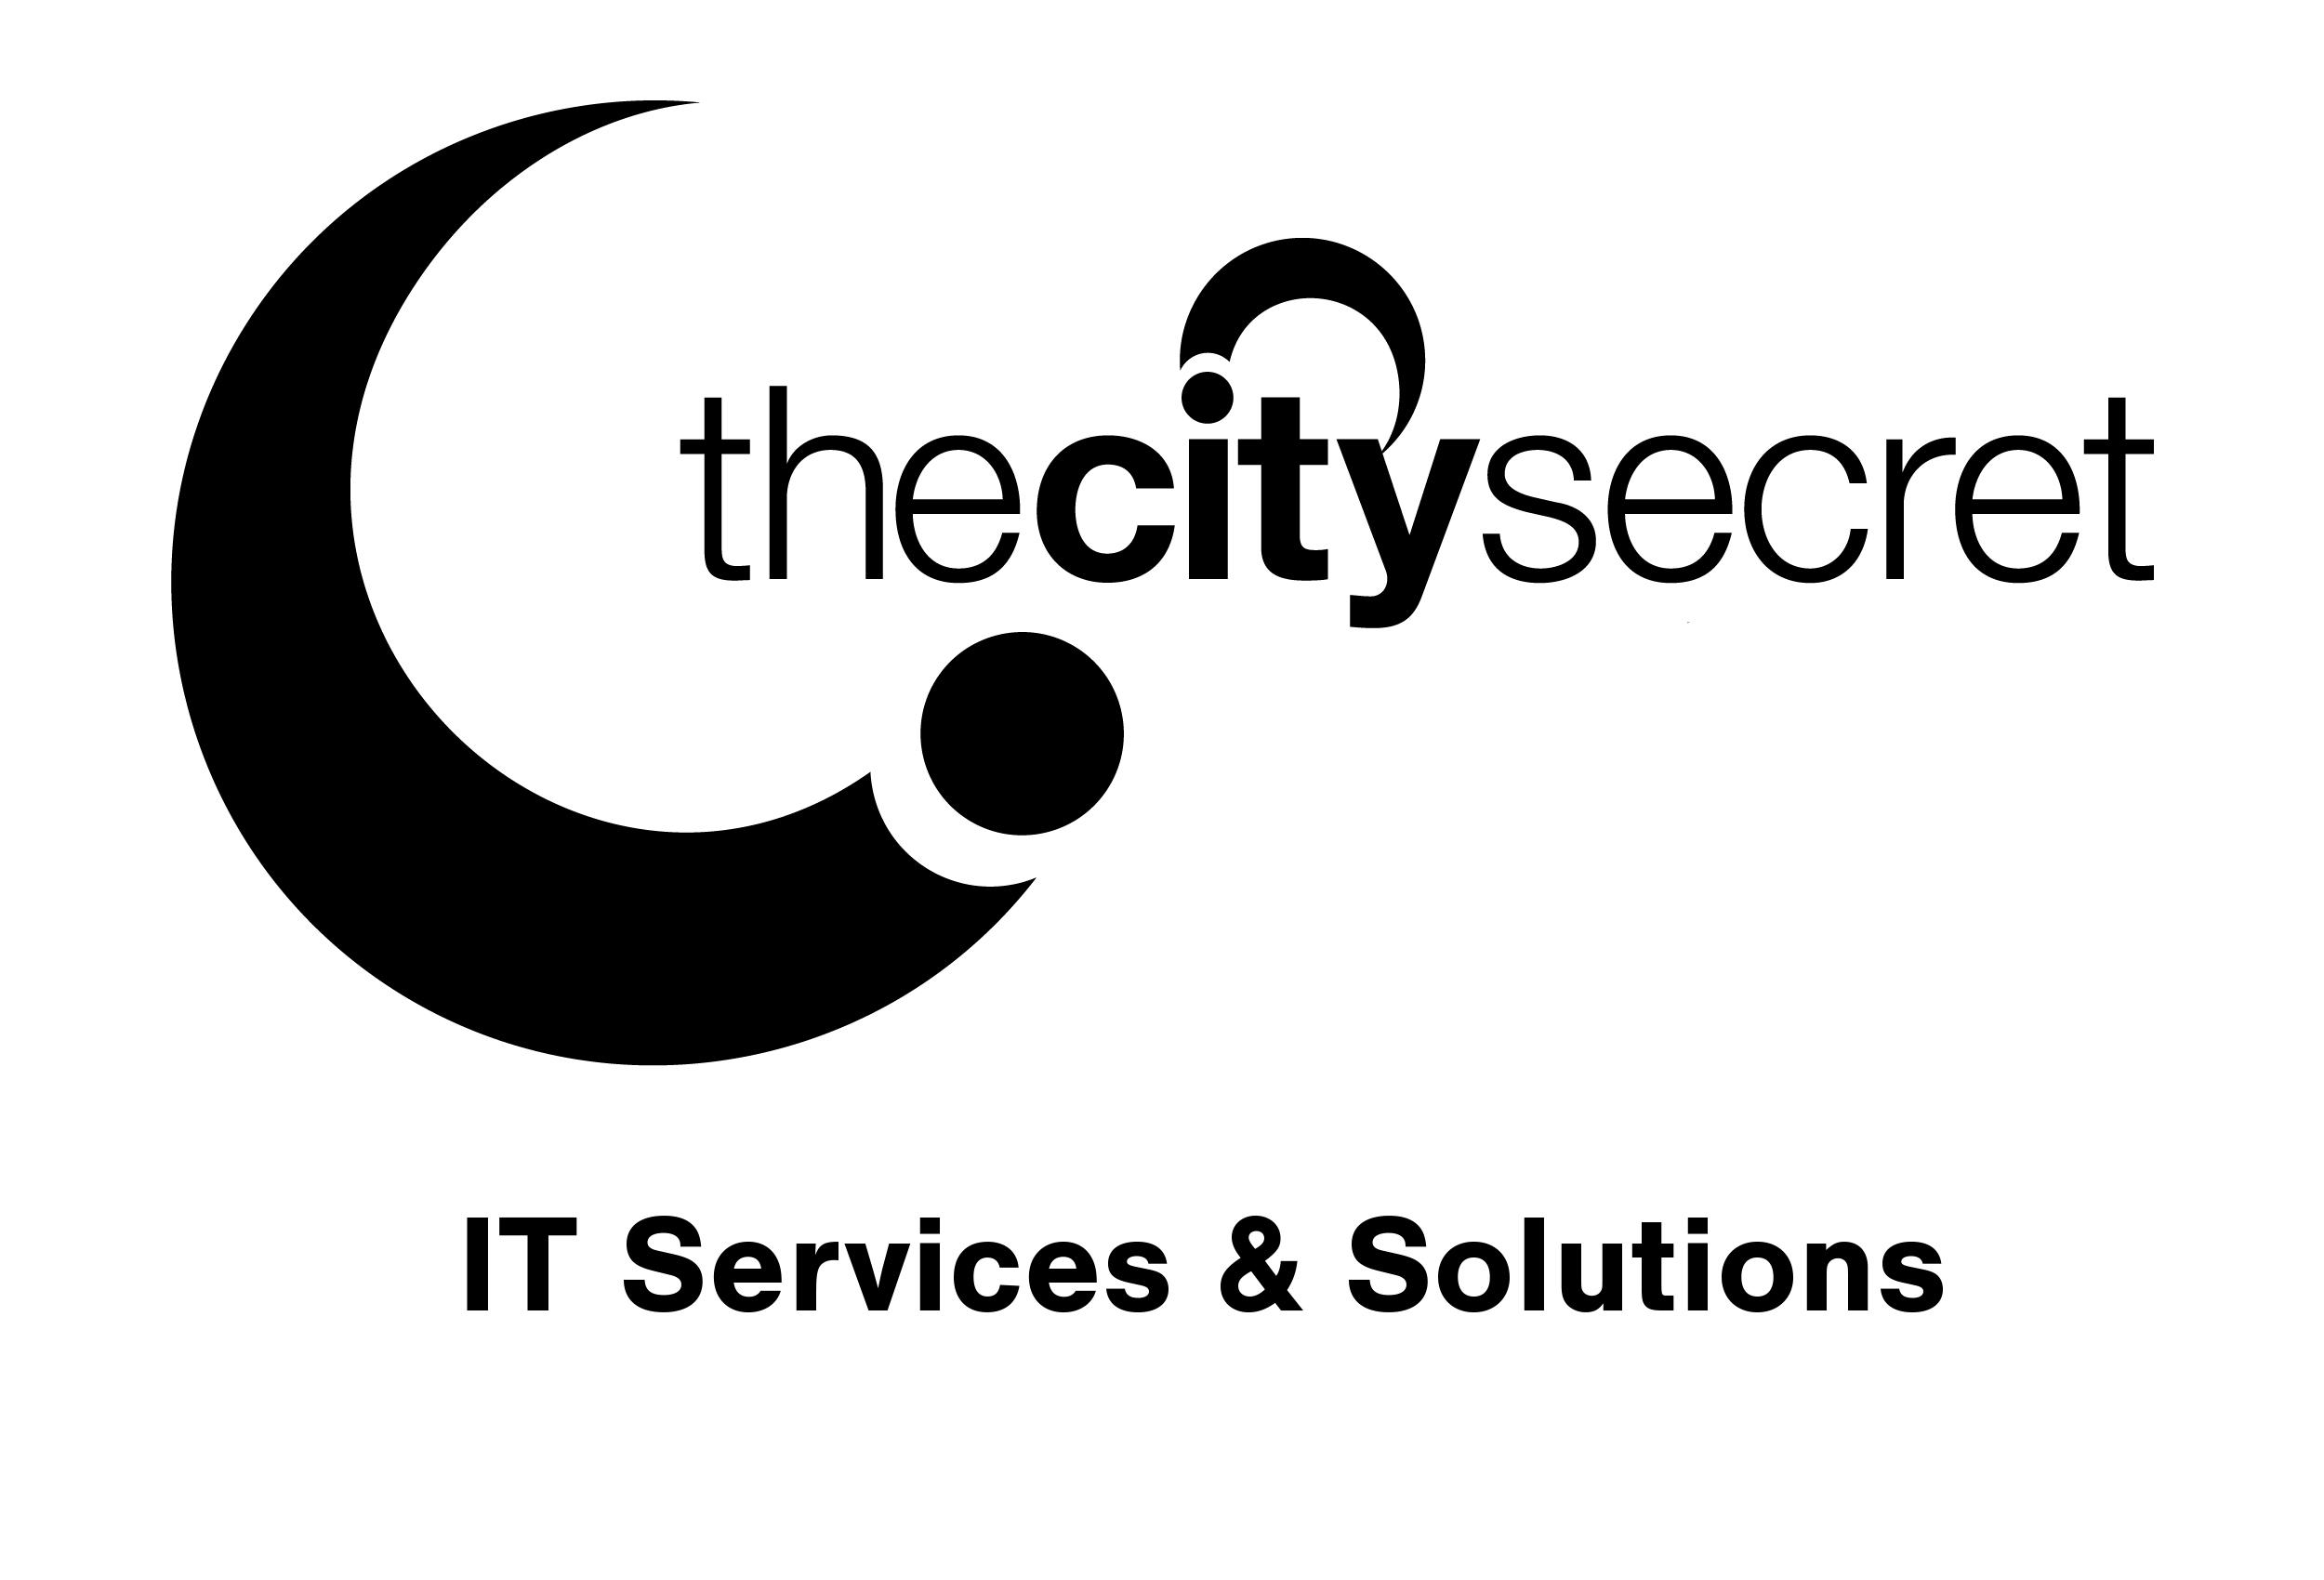 thecitysecret logo